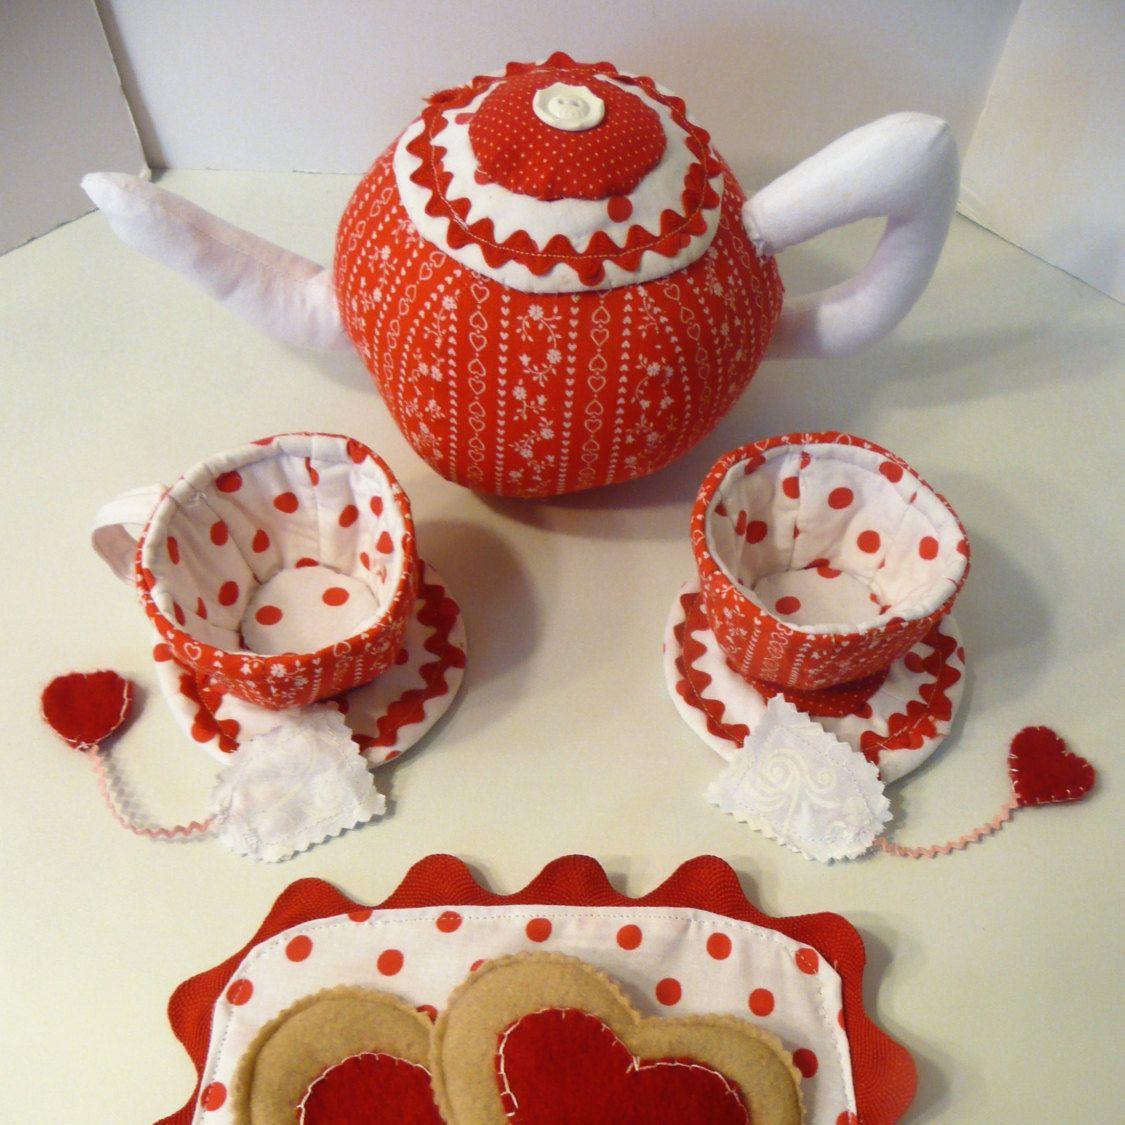 Fabric Tea Set, Pretend Tea Set, Valentine Gift for Kids, Pretend Play, Imaginative Play, Plush Tea Set, Play Tea Set, Valentine Tea Set by ForTheLuvOfThread on Etsy